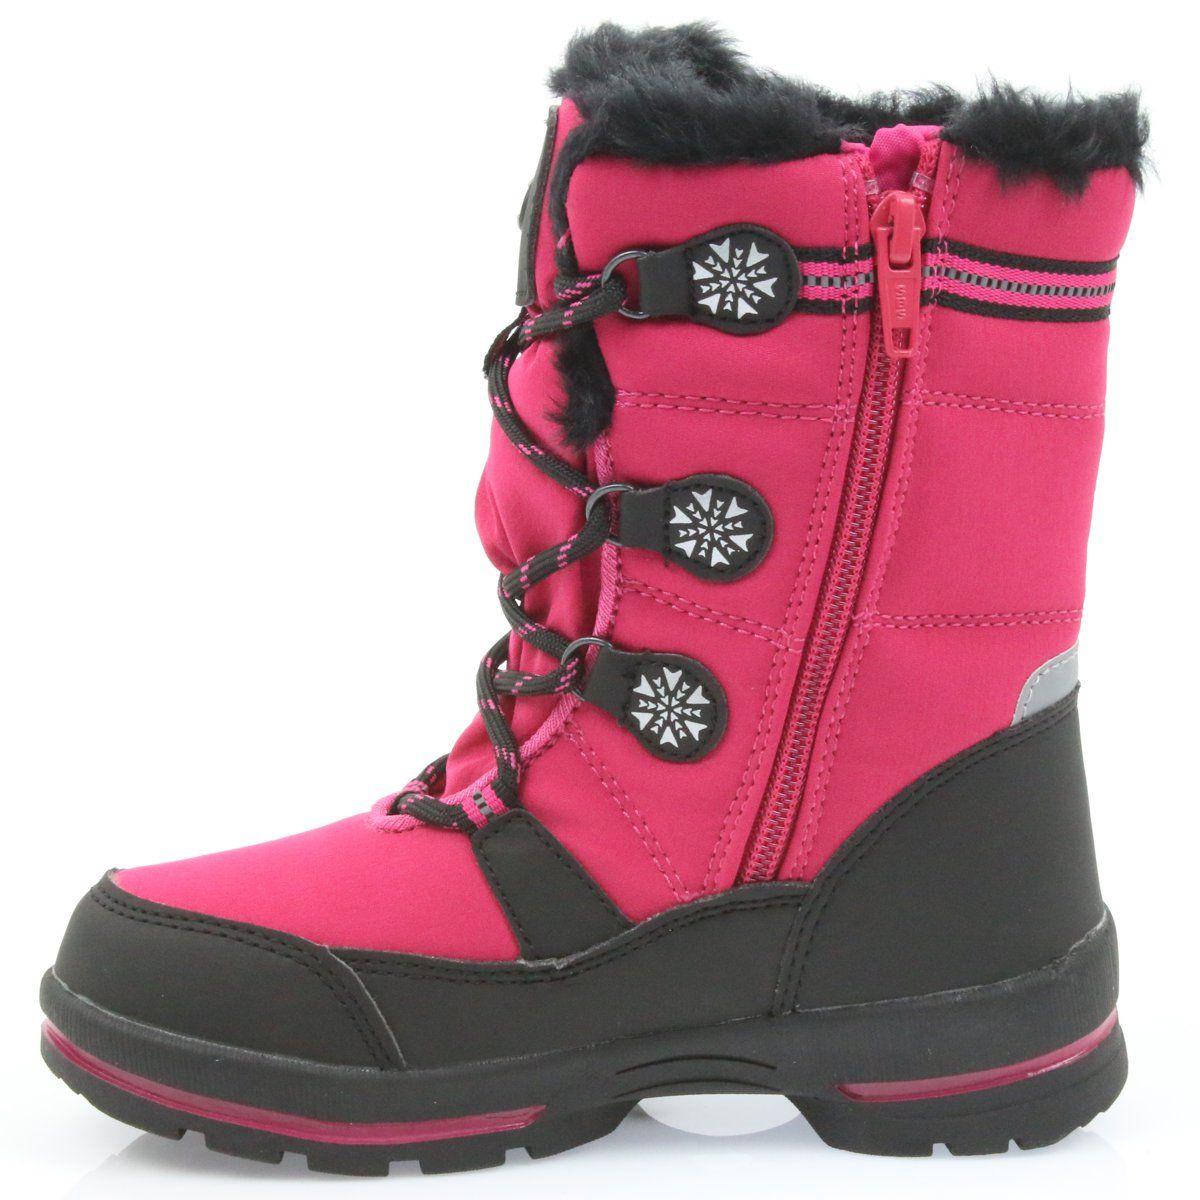 Kozaki Dla Dzieci Americanclub American Club Buty Z Membrana American 702sb Rozowe Boots Shoes Winter Boot